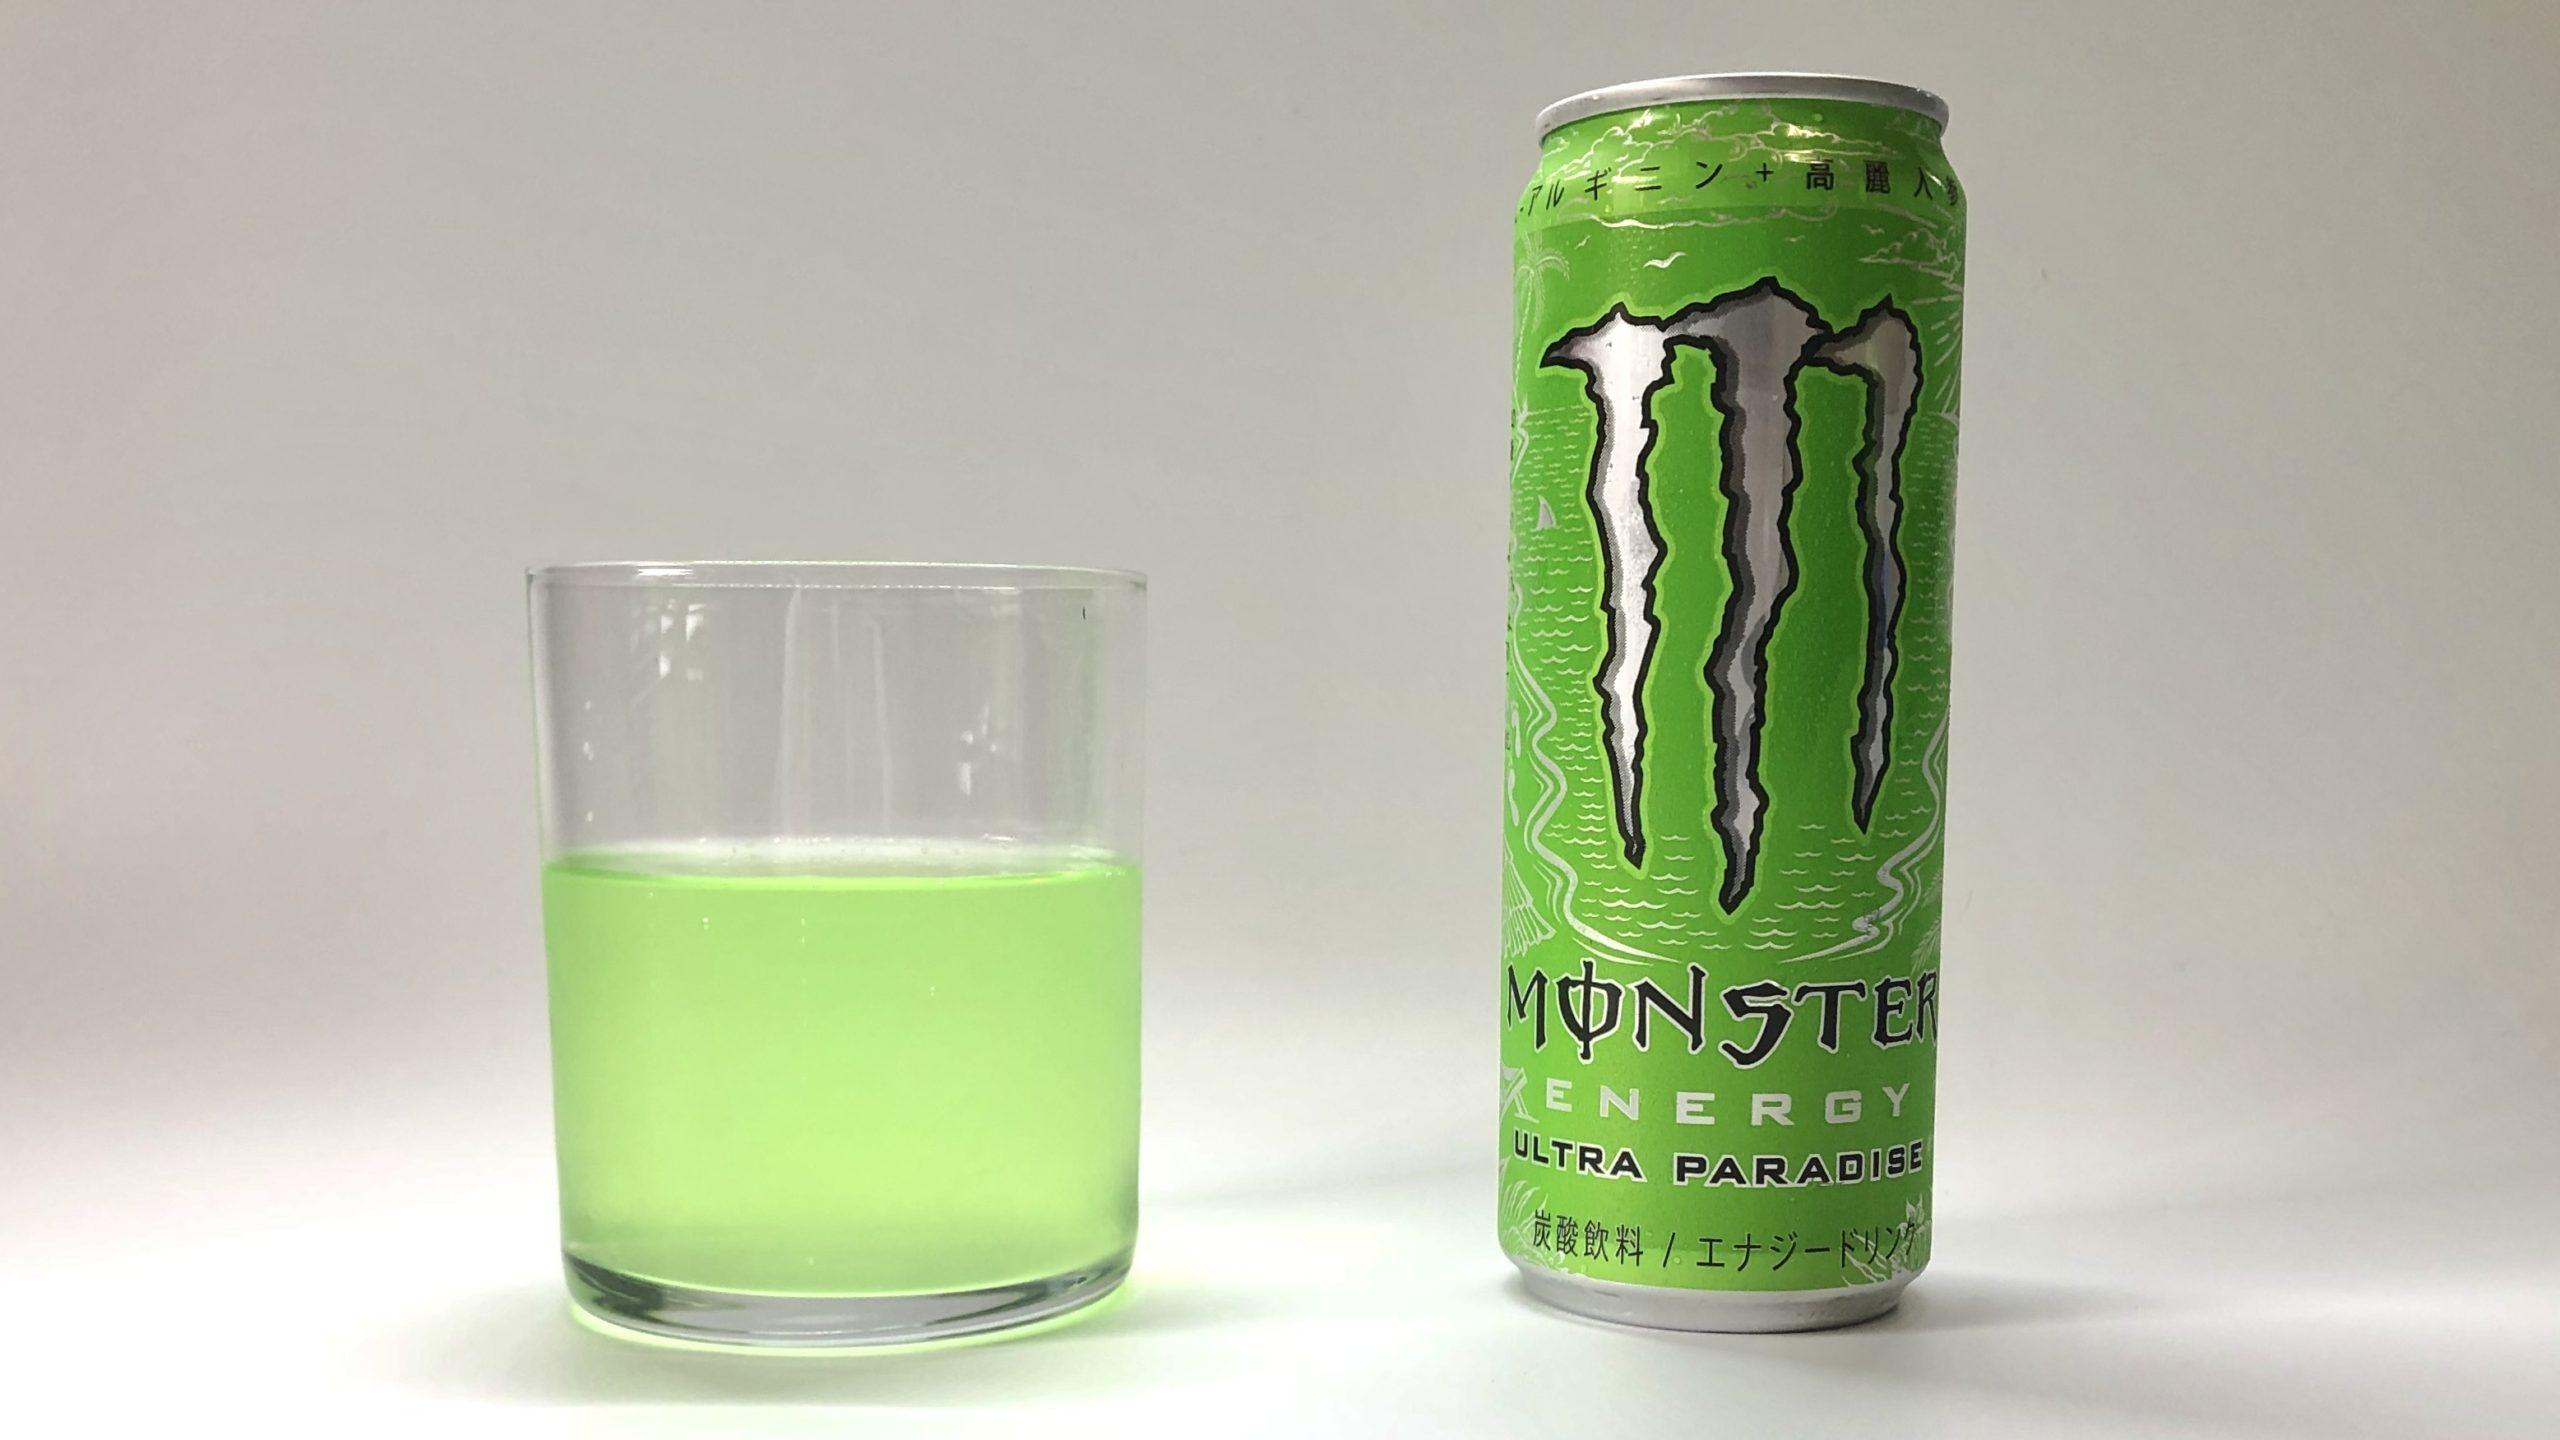 Monster Ultra Paradiseの見た目と味